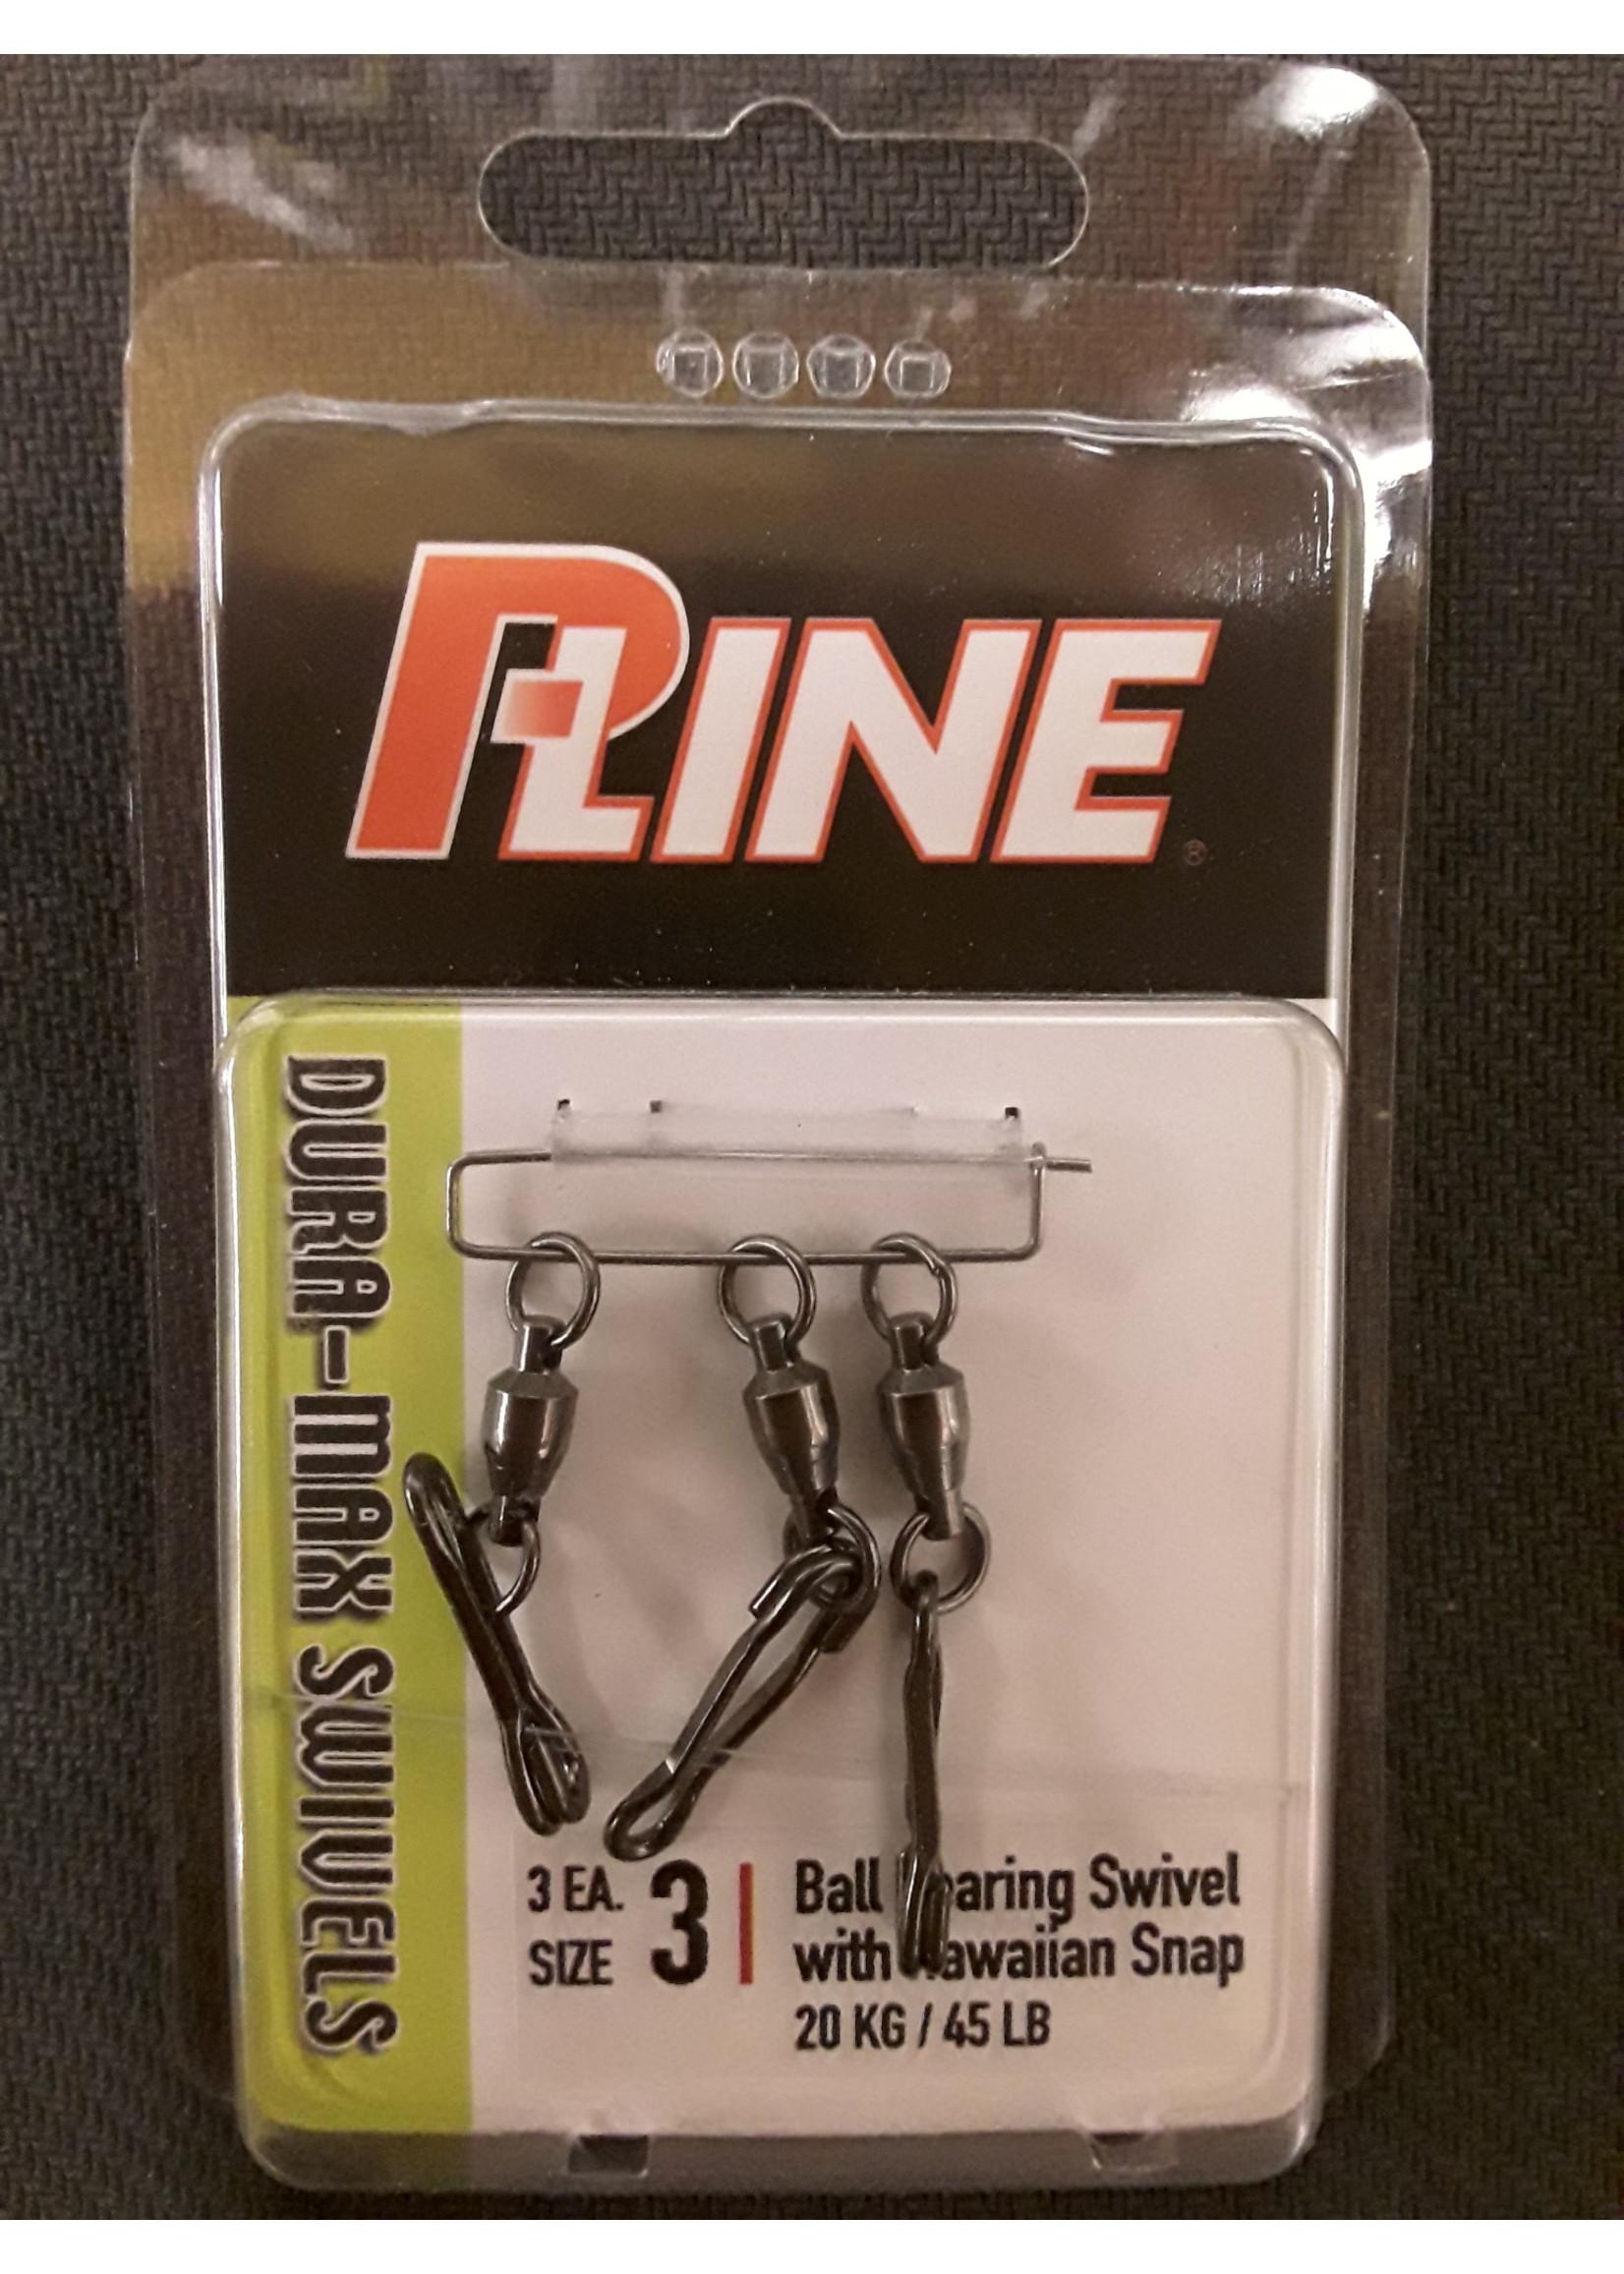 P-LINE P-Line Dura-Max Ball Bearing Swivel w/Hawaiian Snap